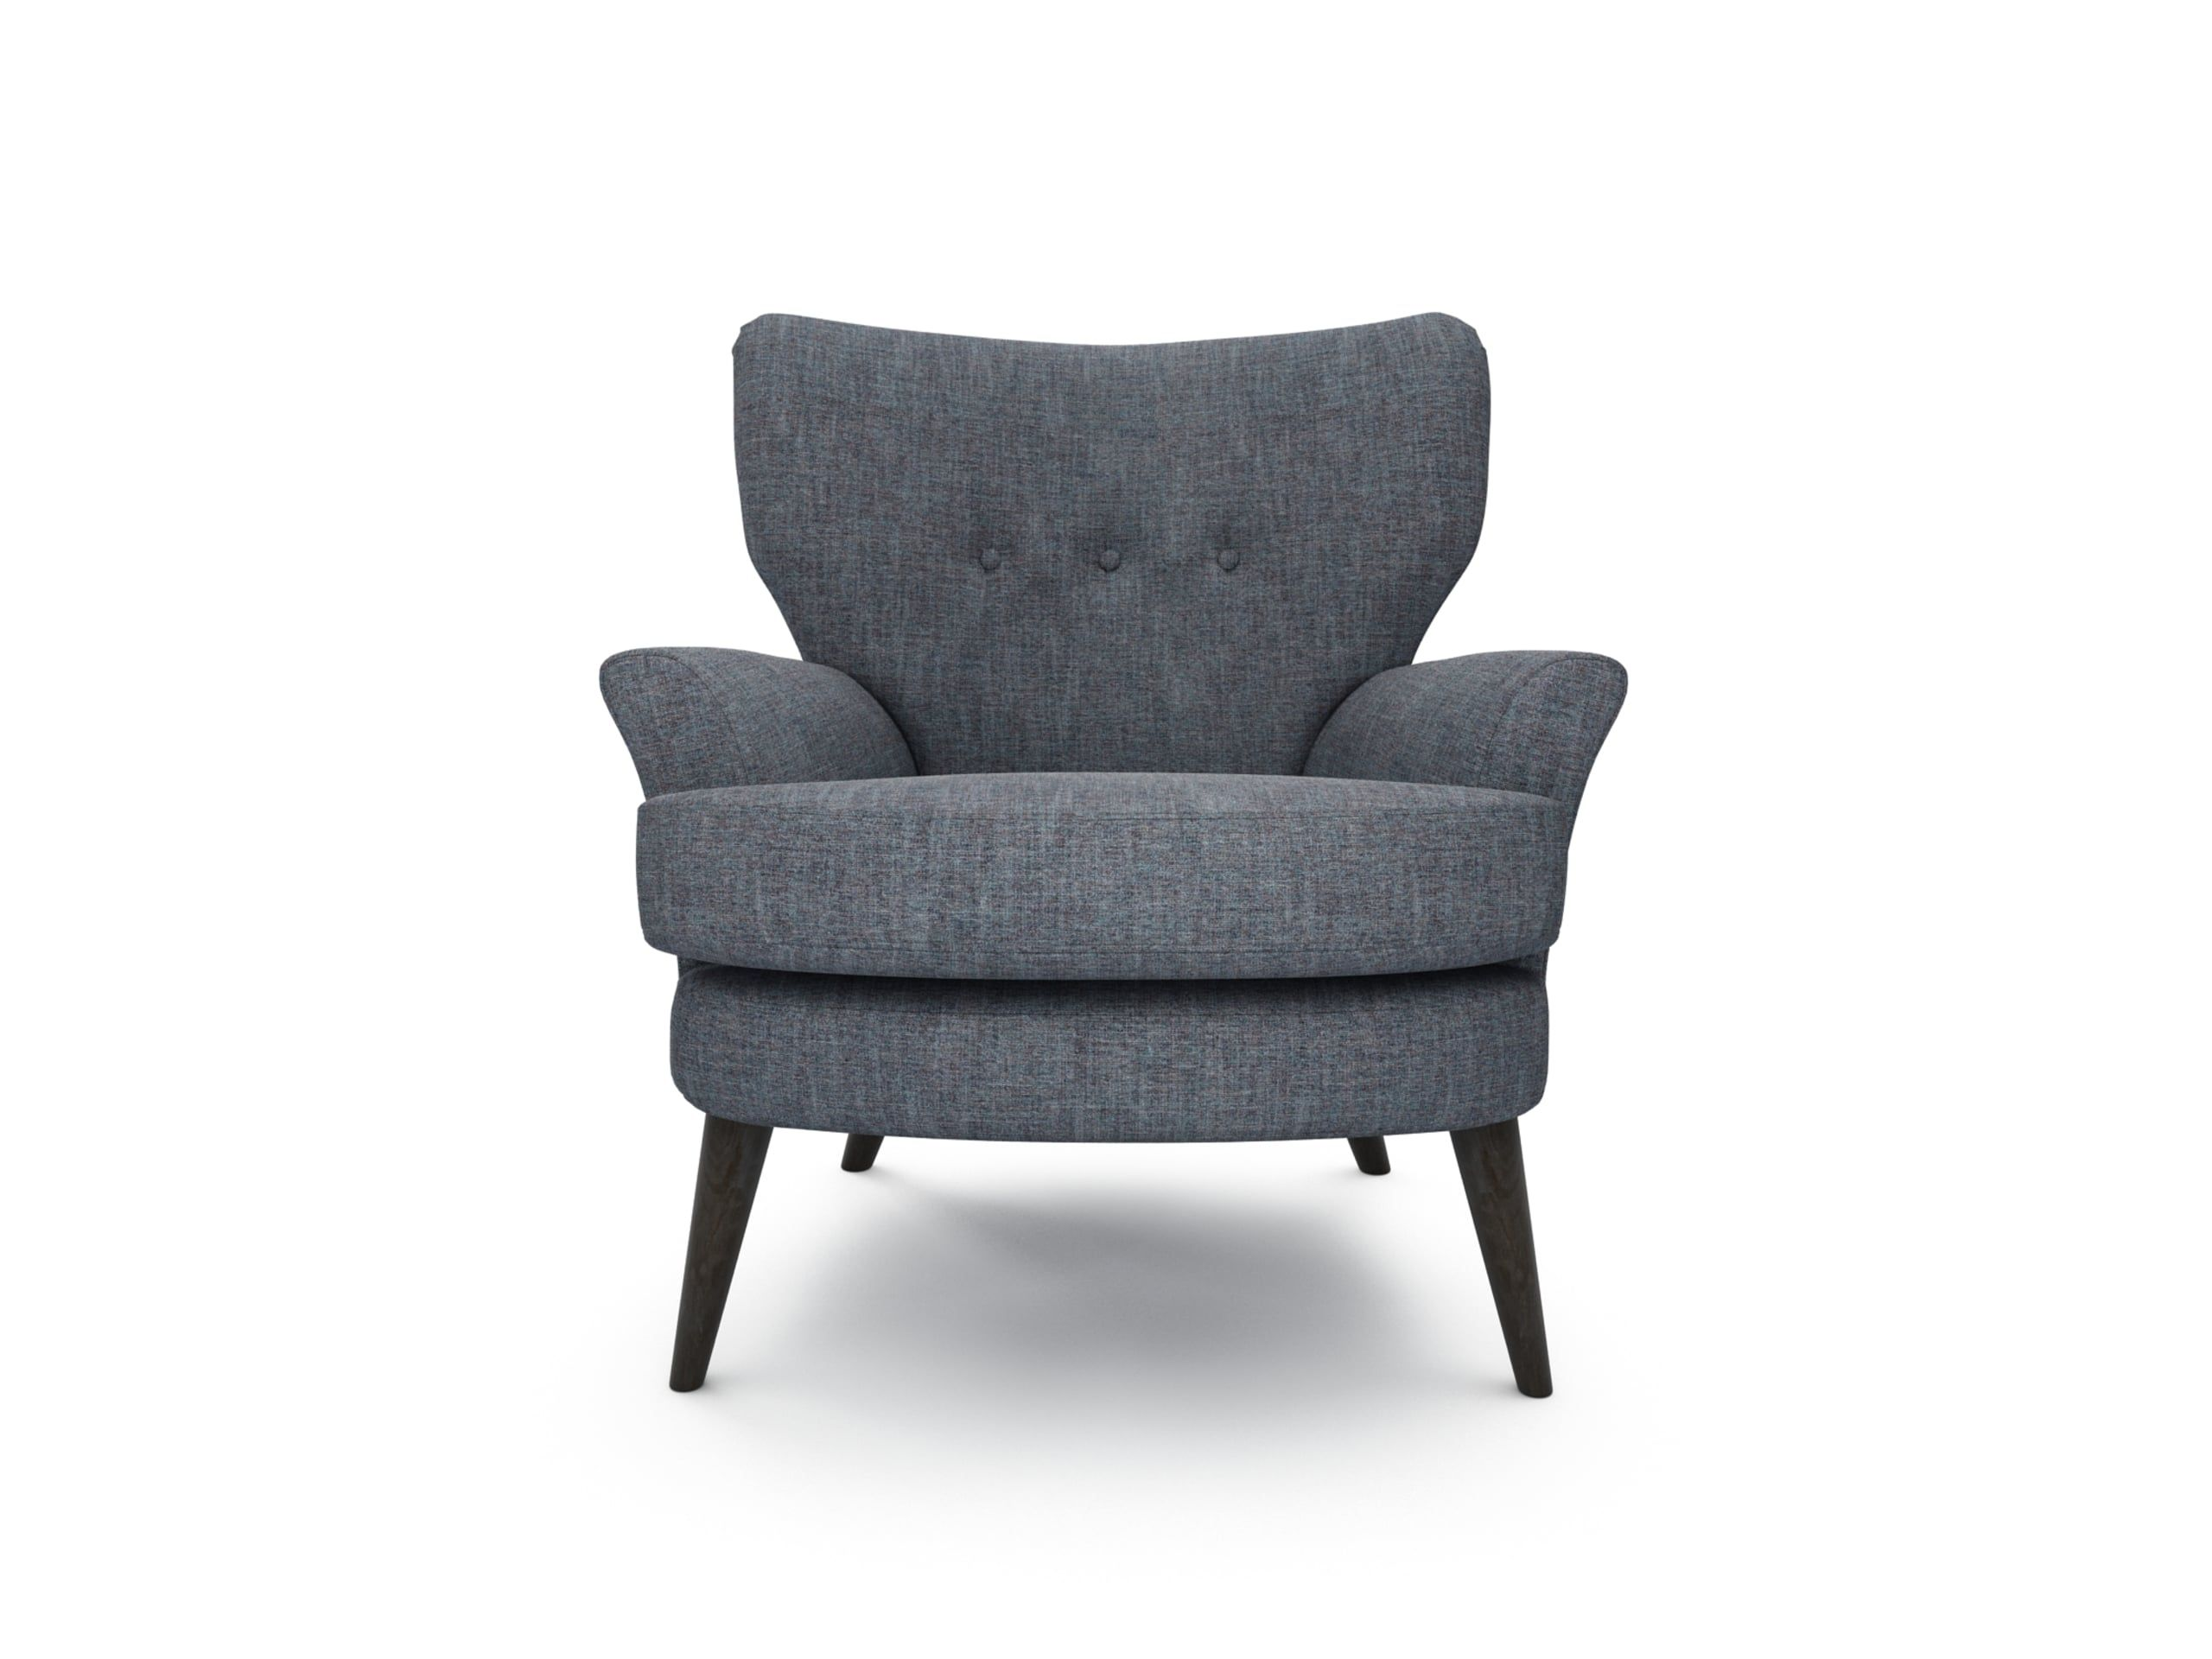 The Lounge Co. Noah Chair in Family Friendly Kaleidoscope Weave